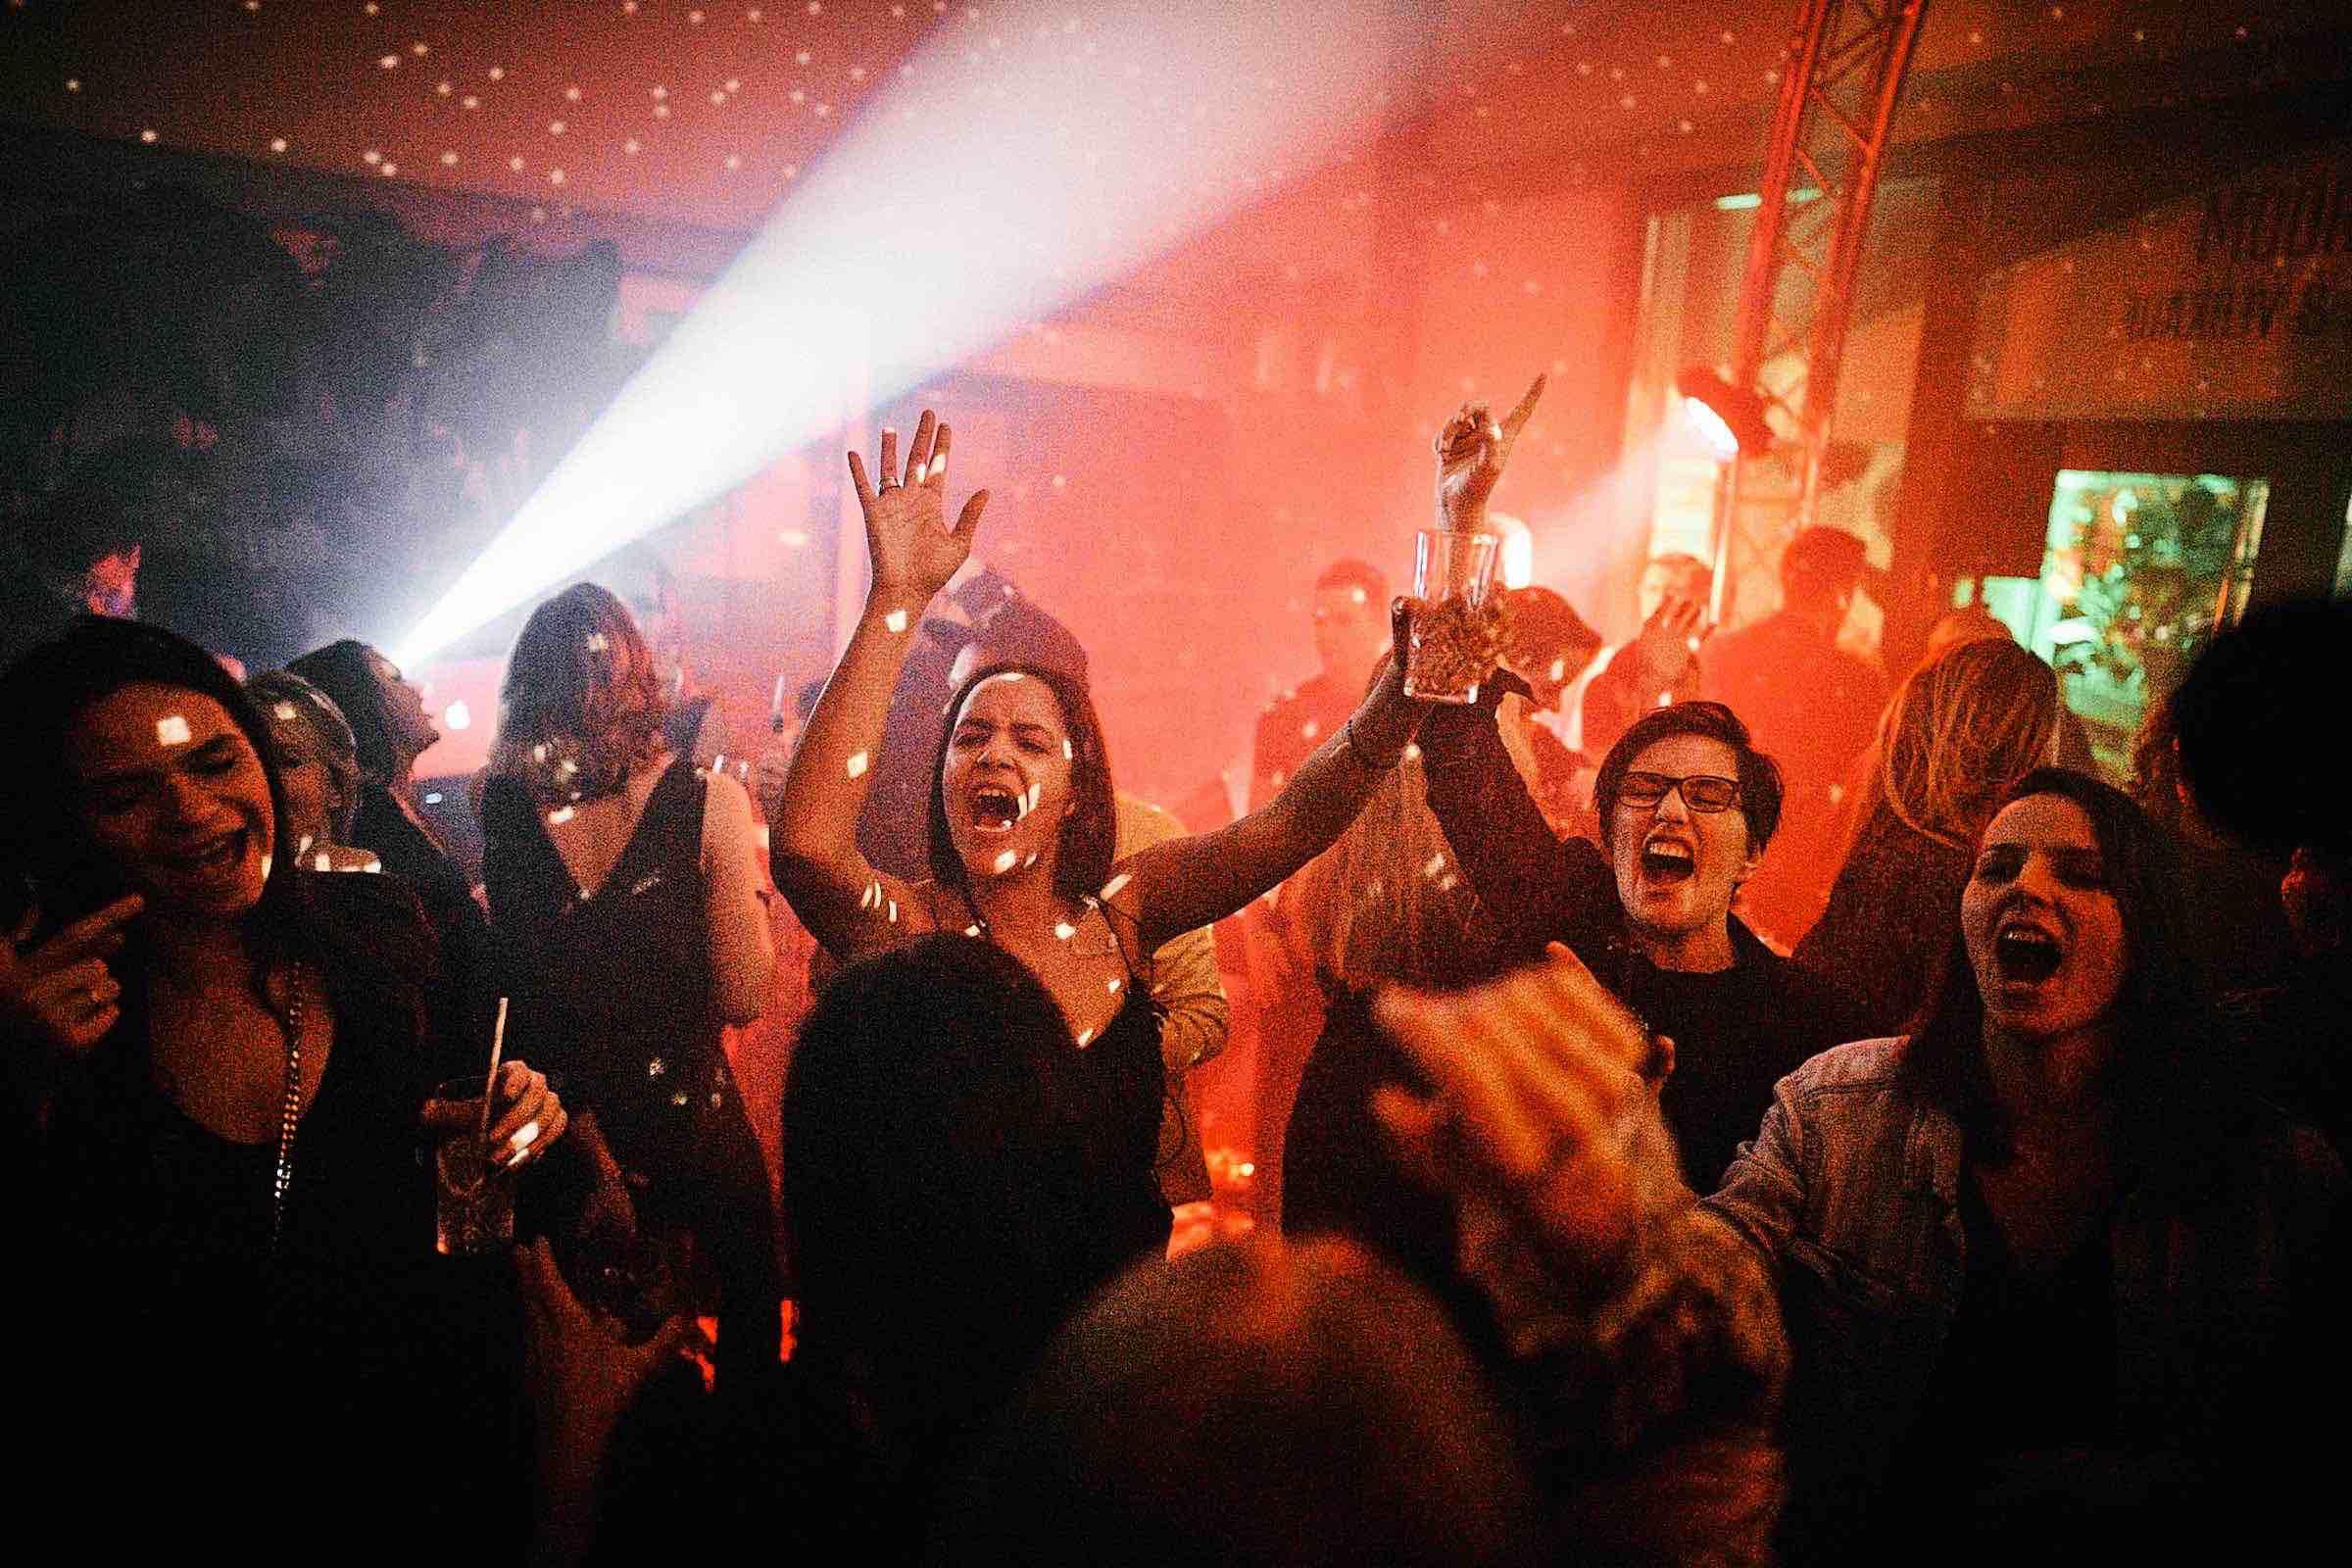 DJ   Hochzeit   DJ   Agentur   DJ   Service   Hamburg   DJ   Feier   Hochzeits   DJ   Messe   DJ   Firmenevent   Firmenfeier   DJ   Geburtstag   Discjockey   Weihnachtsfeier   DJ   Sommerfest   Event   Buchen   Mieten   Hamburgfeiert